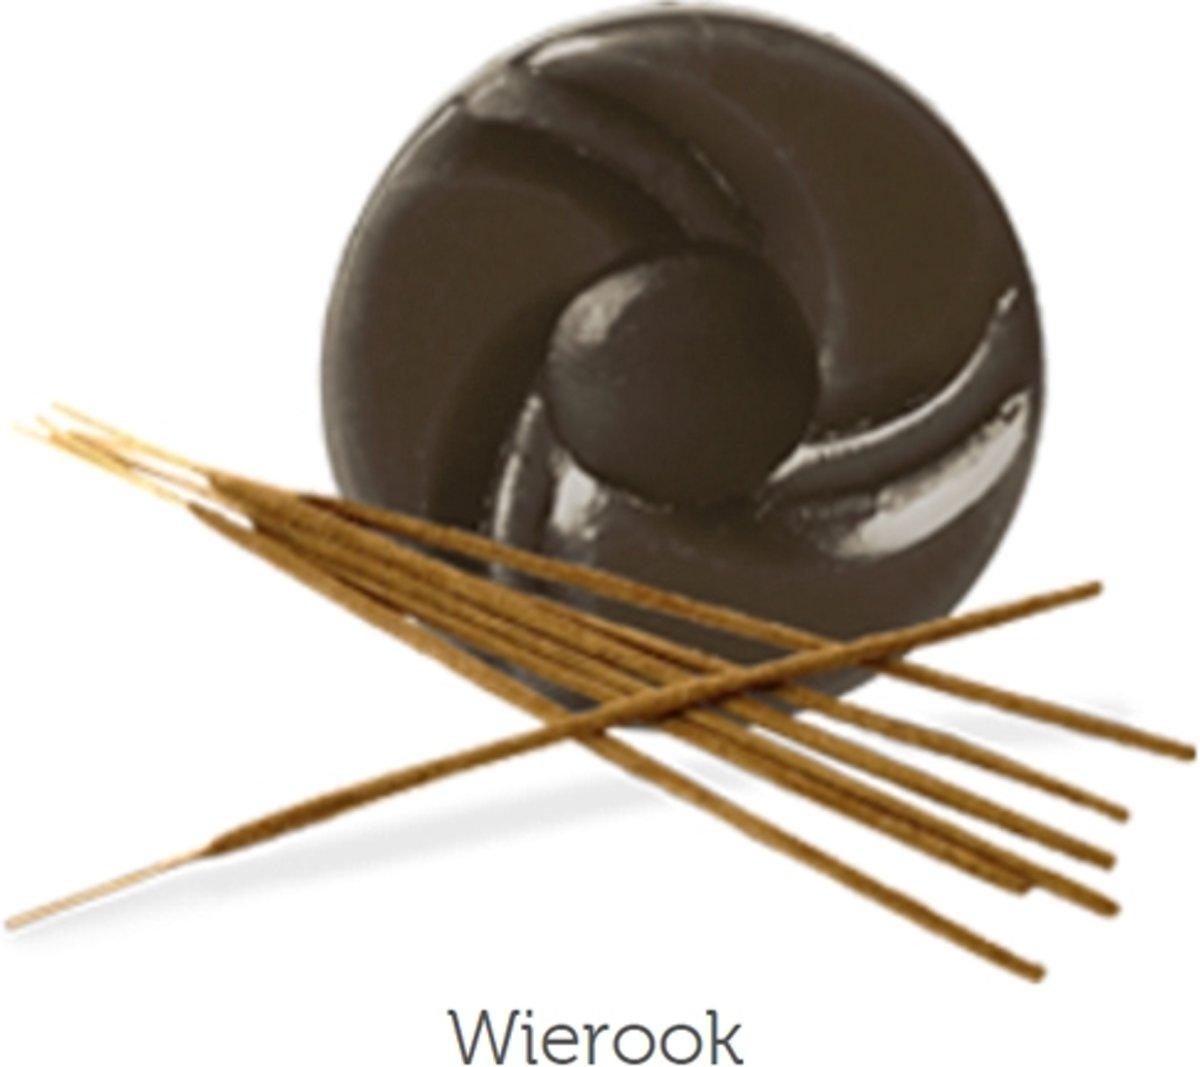 CreaScents Geur chips 'Wierook' kopen